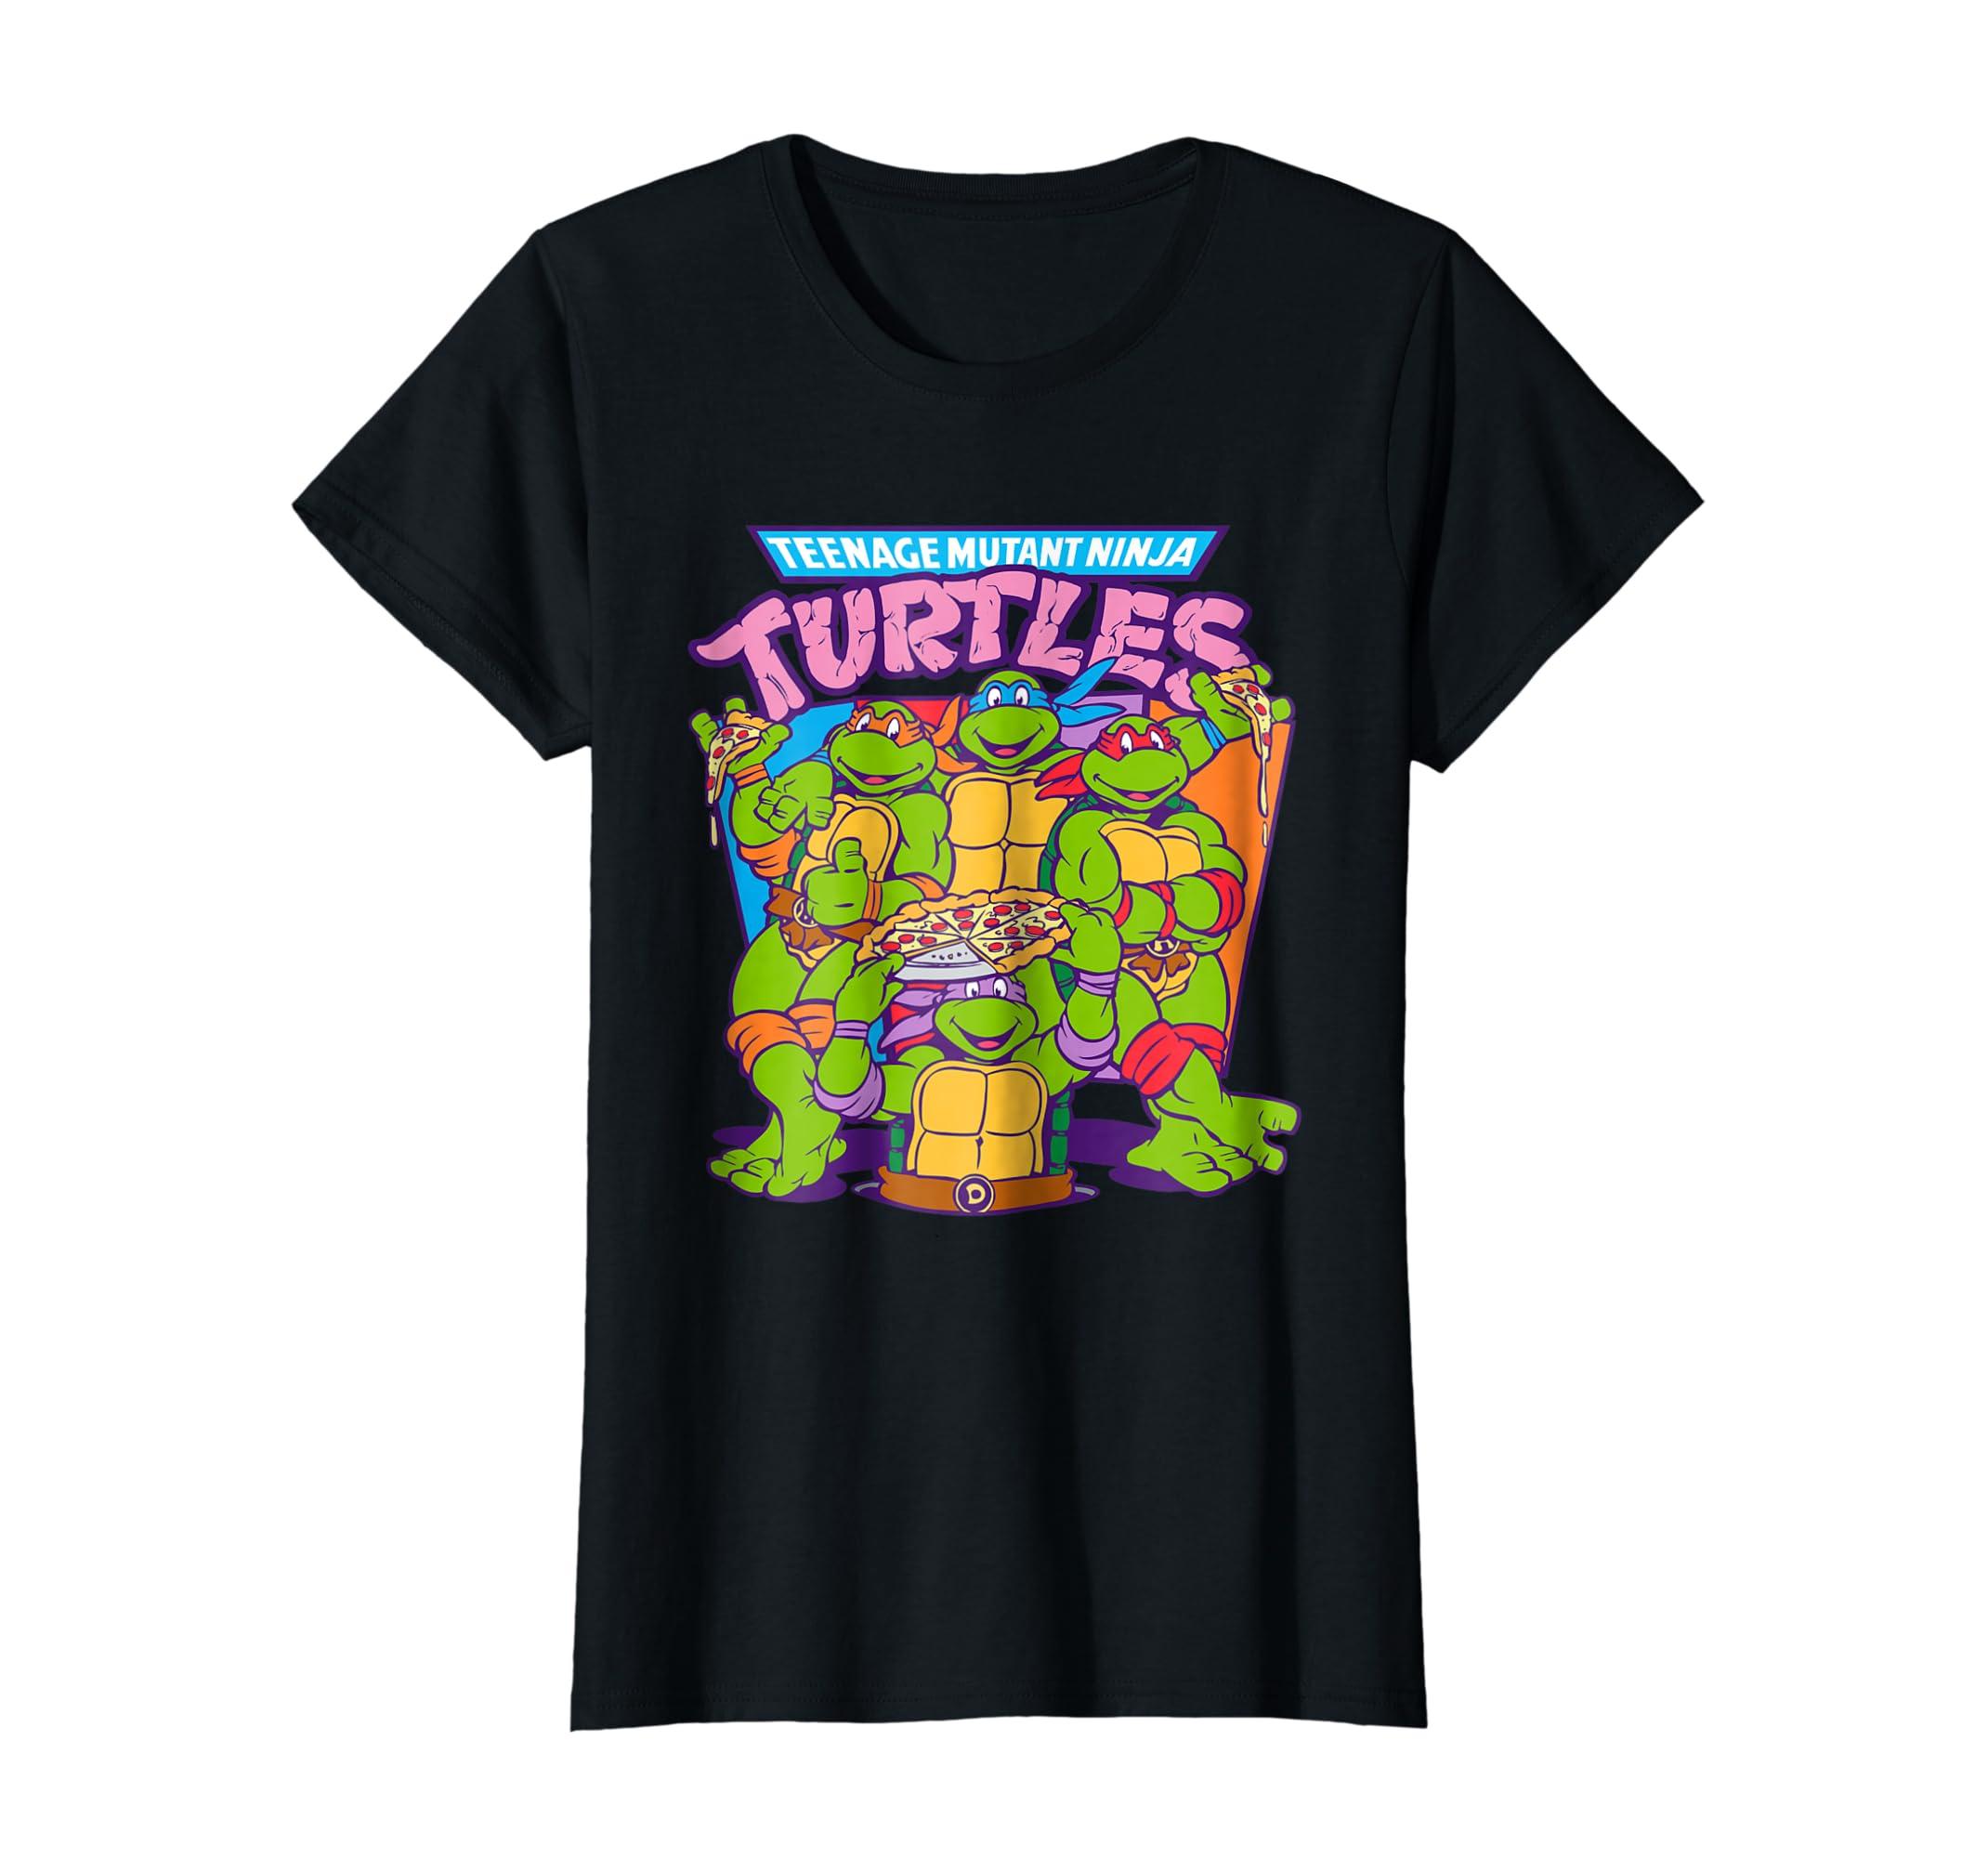 7796a84ad Amazon.com: Teenage Mutant Ninja Turtles Pizza & Smiles T-Shirt: Clothing